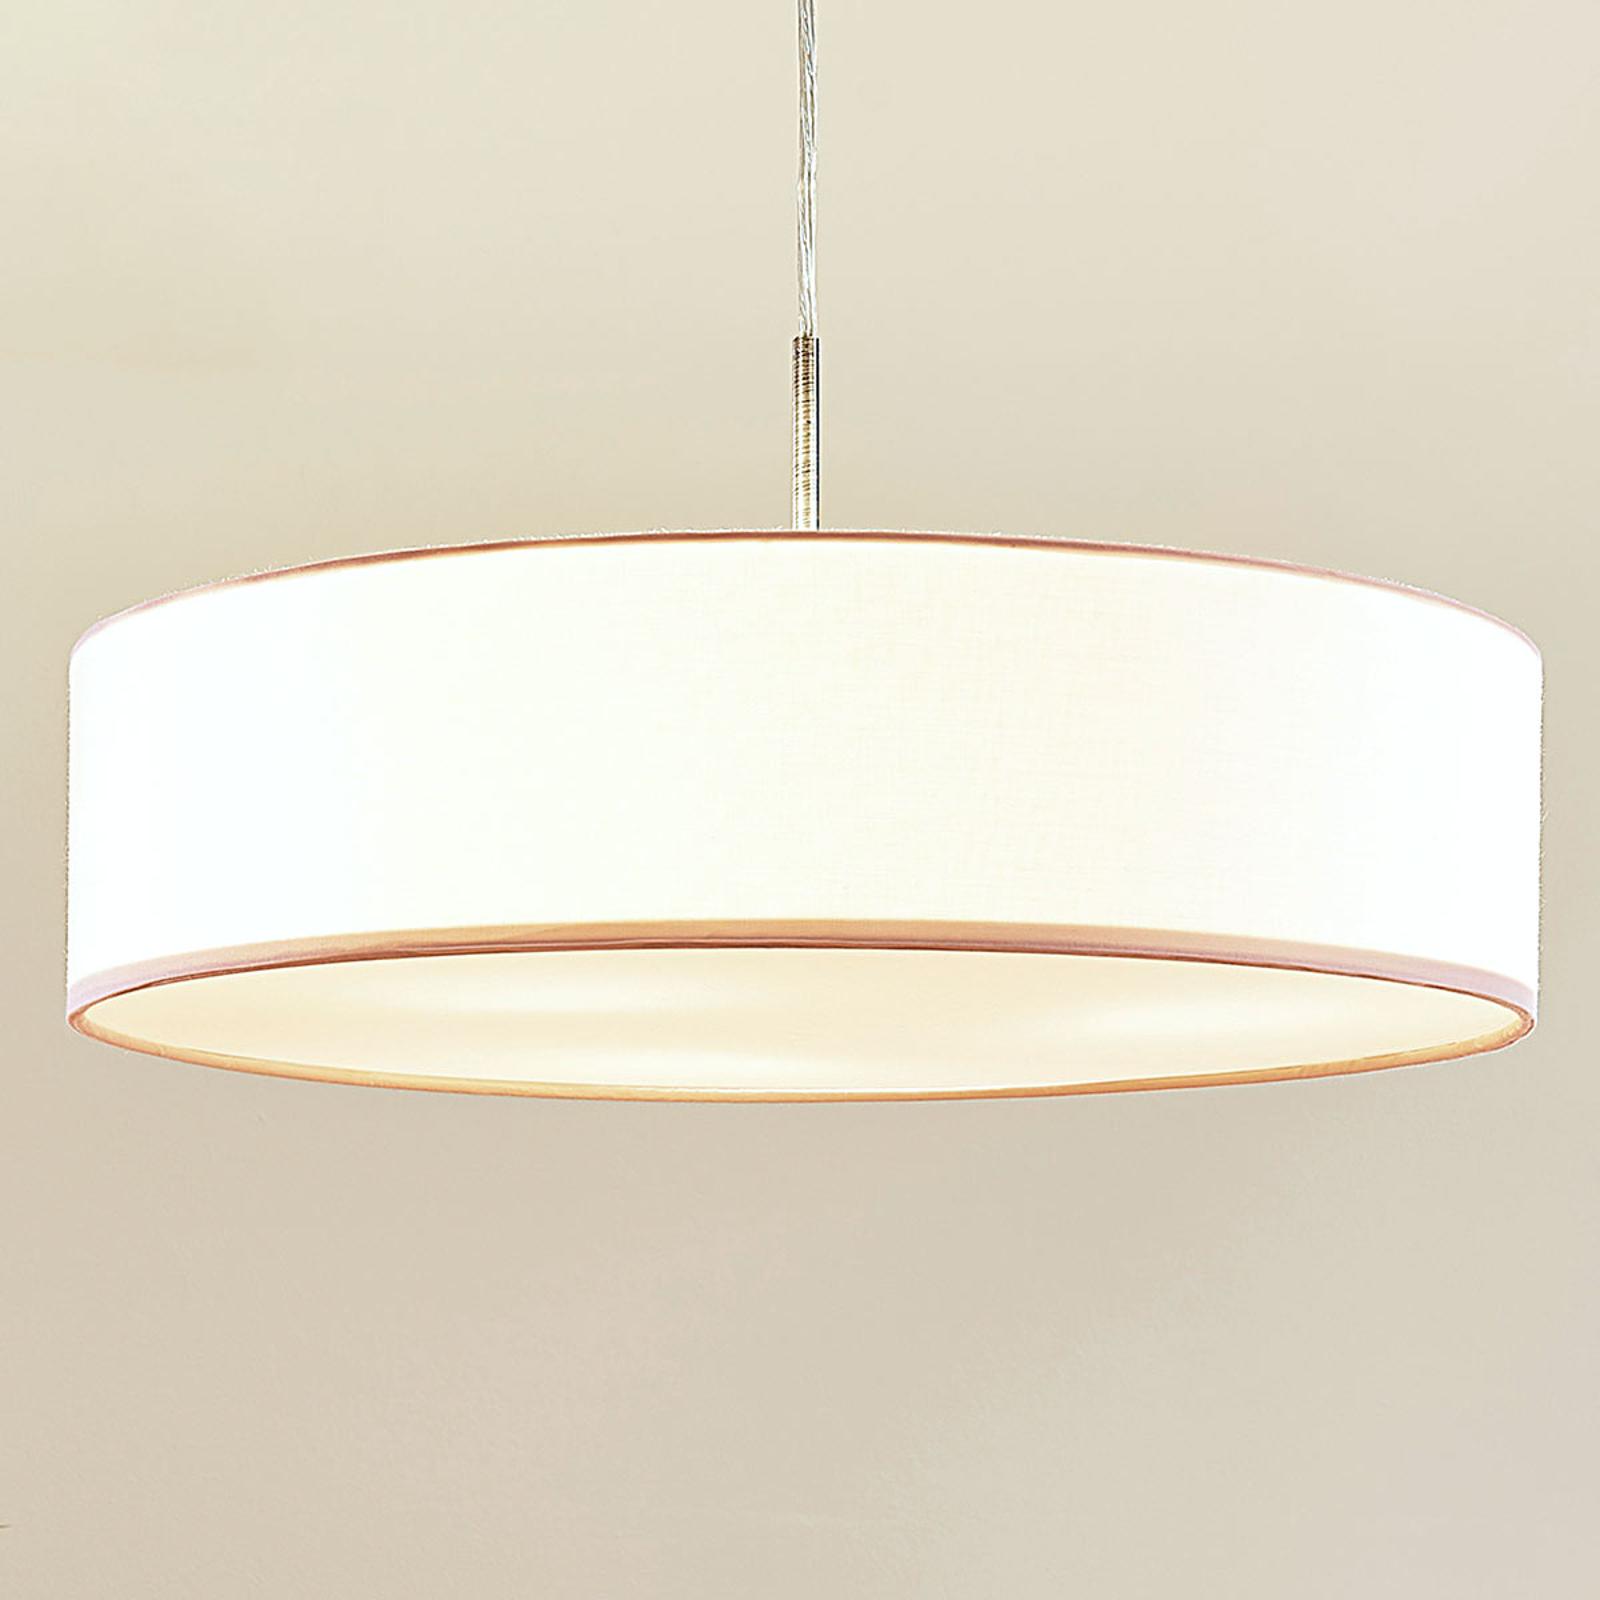 Suspension LED Sebatin en tissu blanc